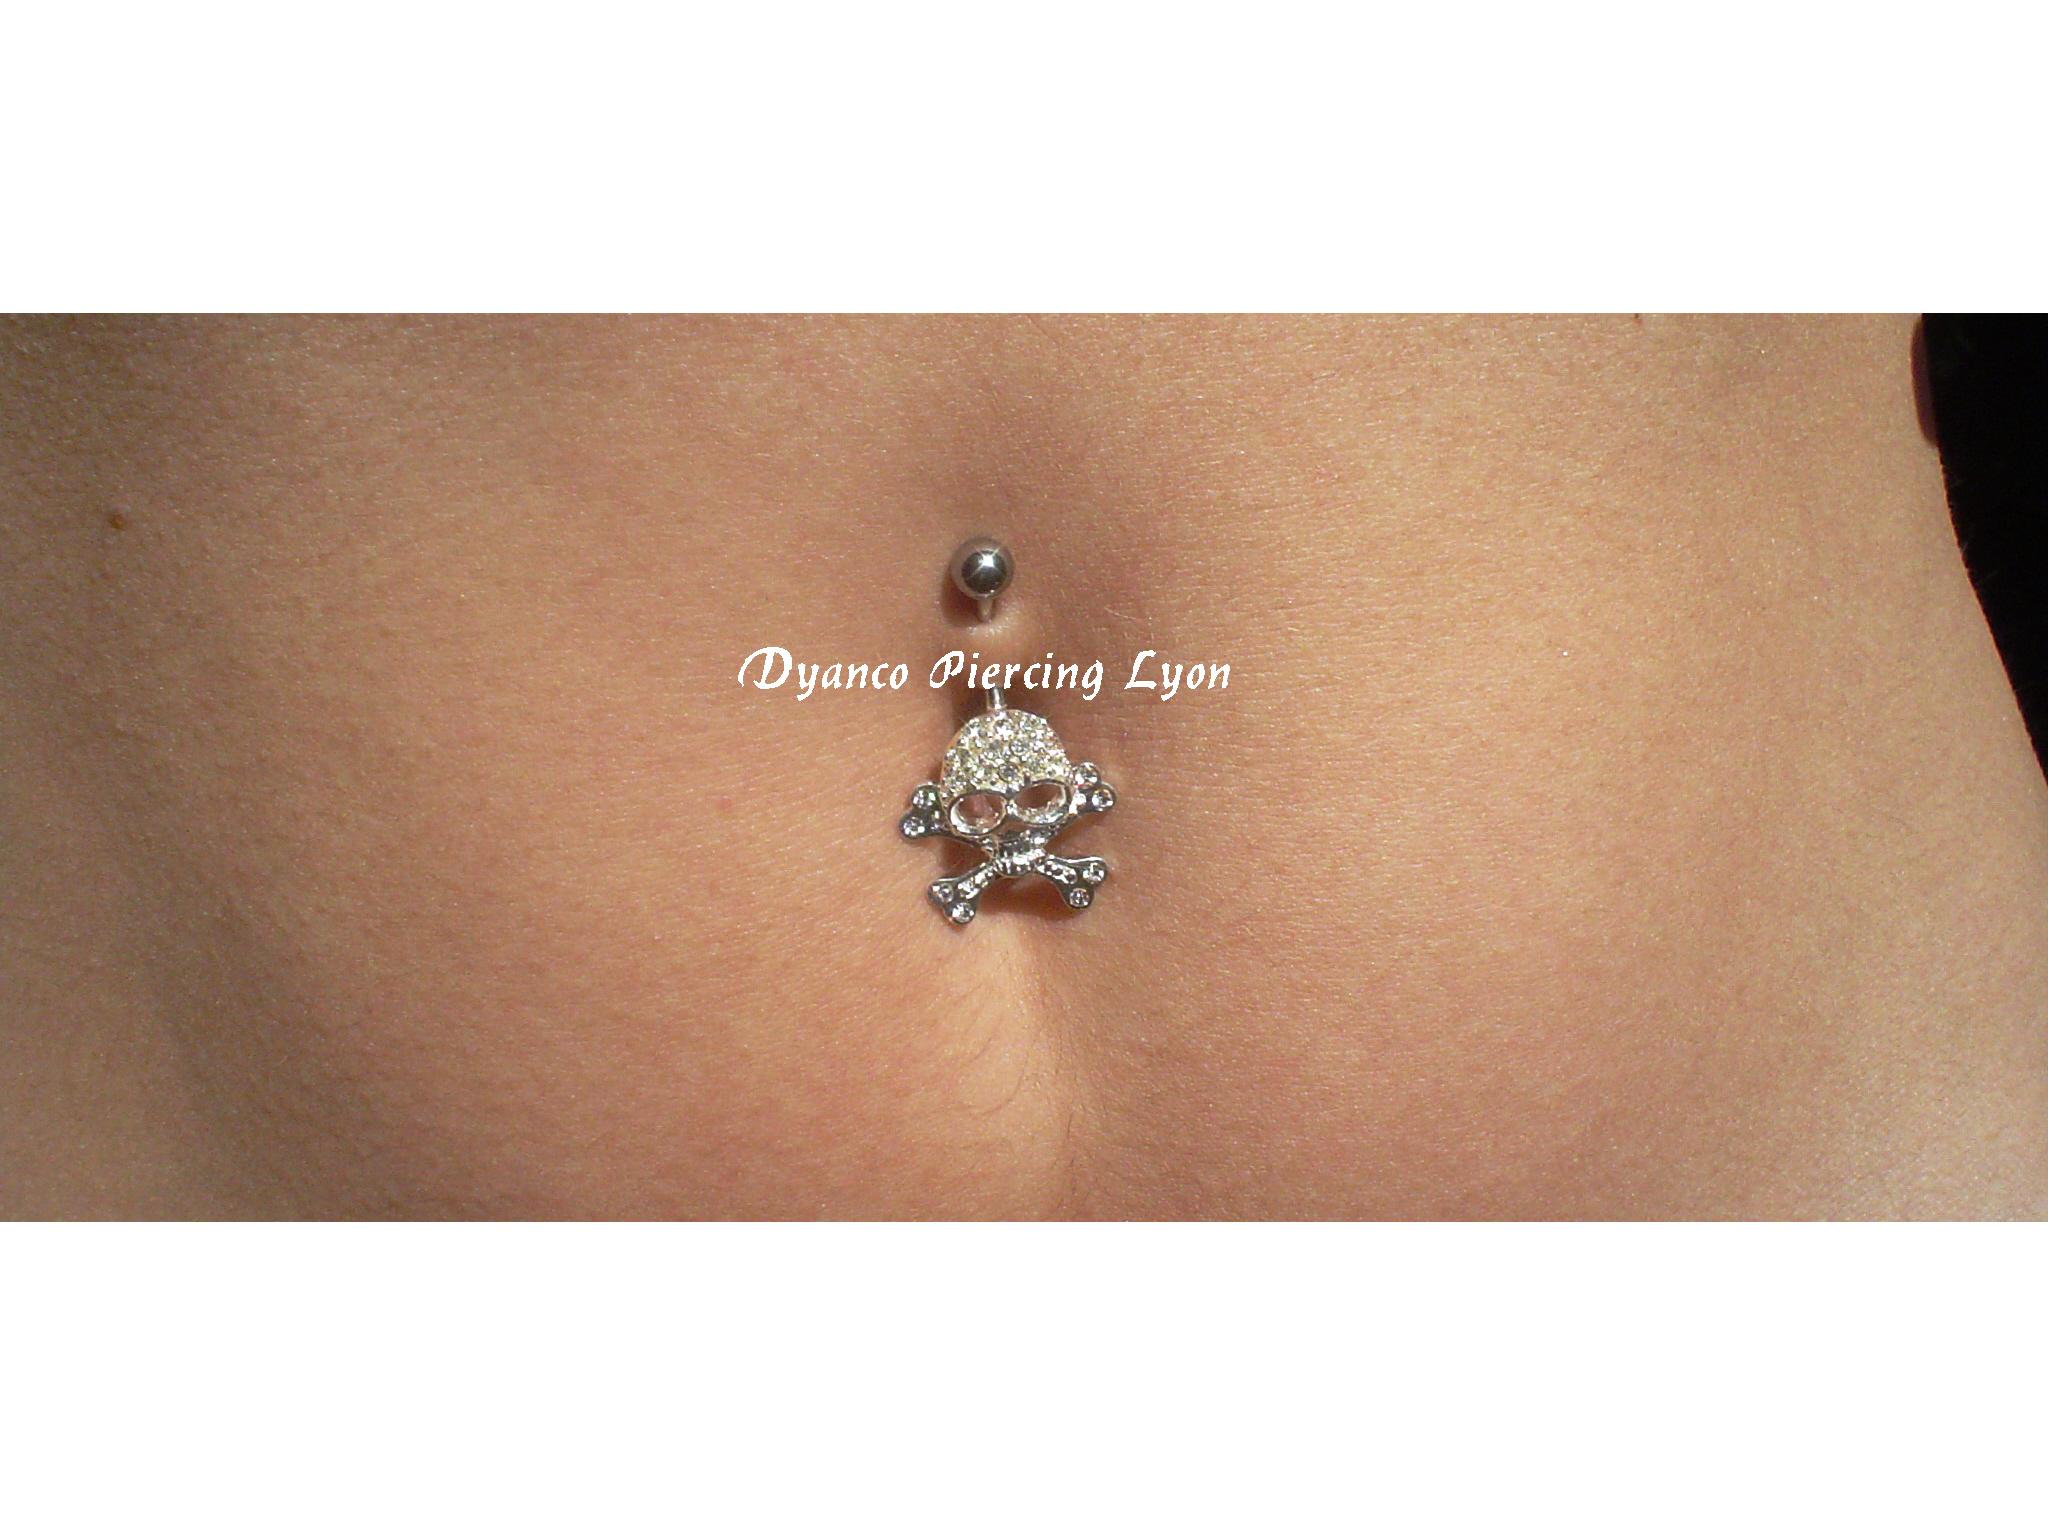 dyanco piercing lyon 68.jpg